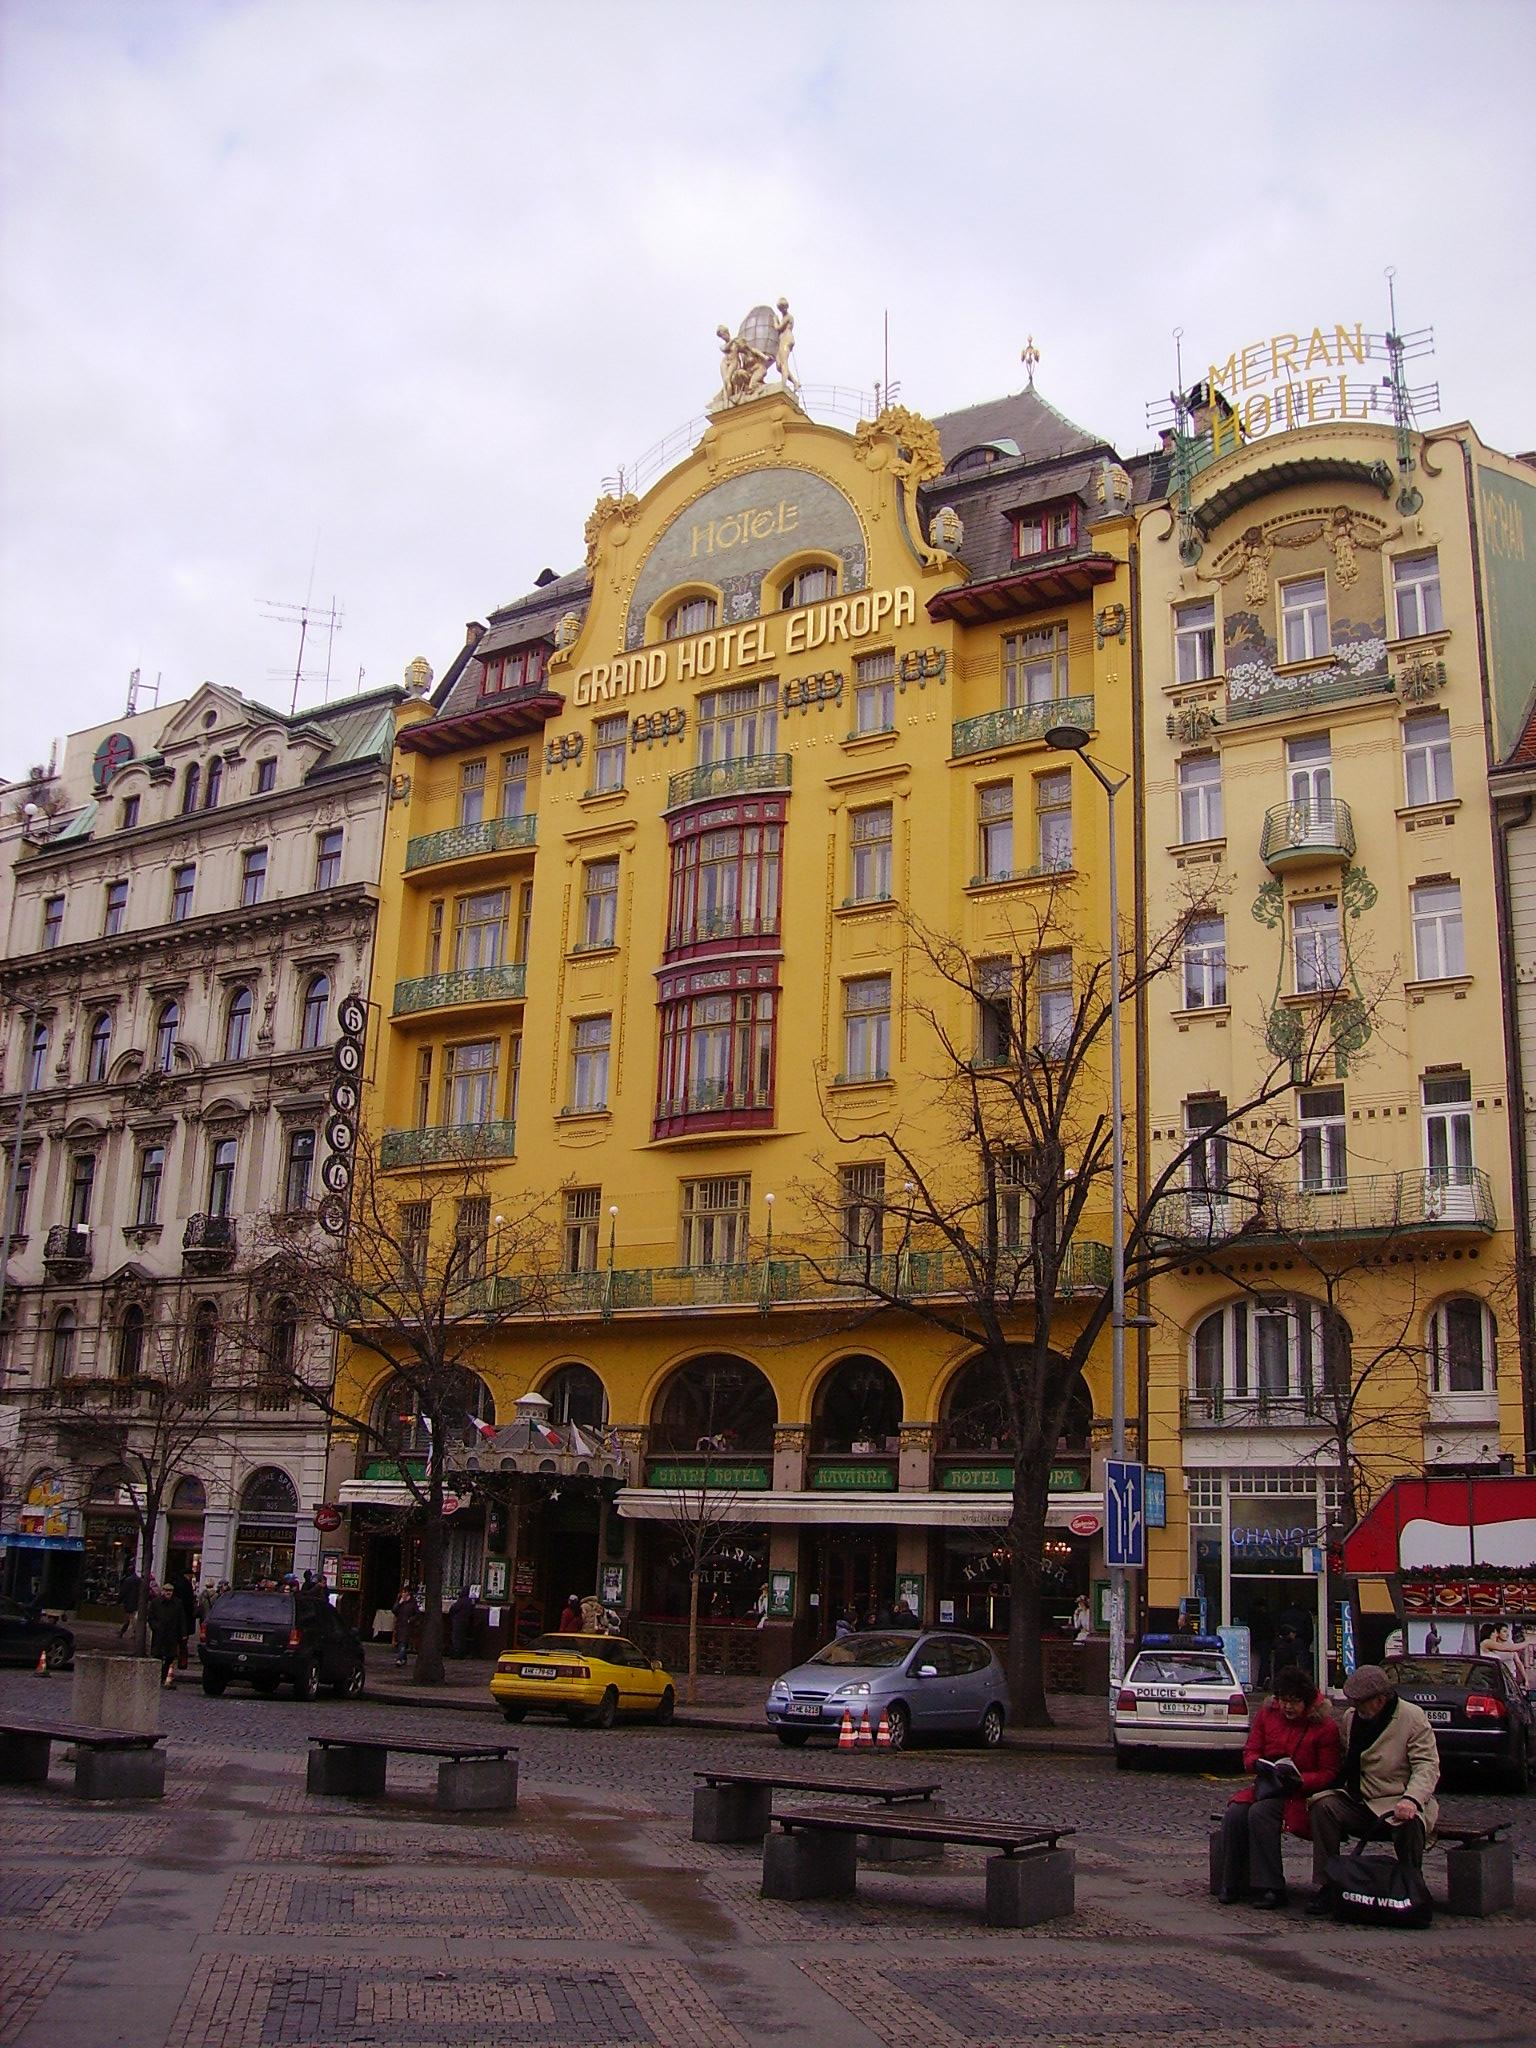 file prag wenzelsplatz grand europa hotel jpg wikimedia commons. Black Bedroom Furniture Sets. Home Design Ideas